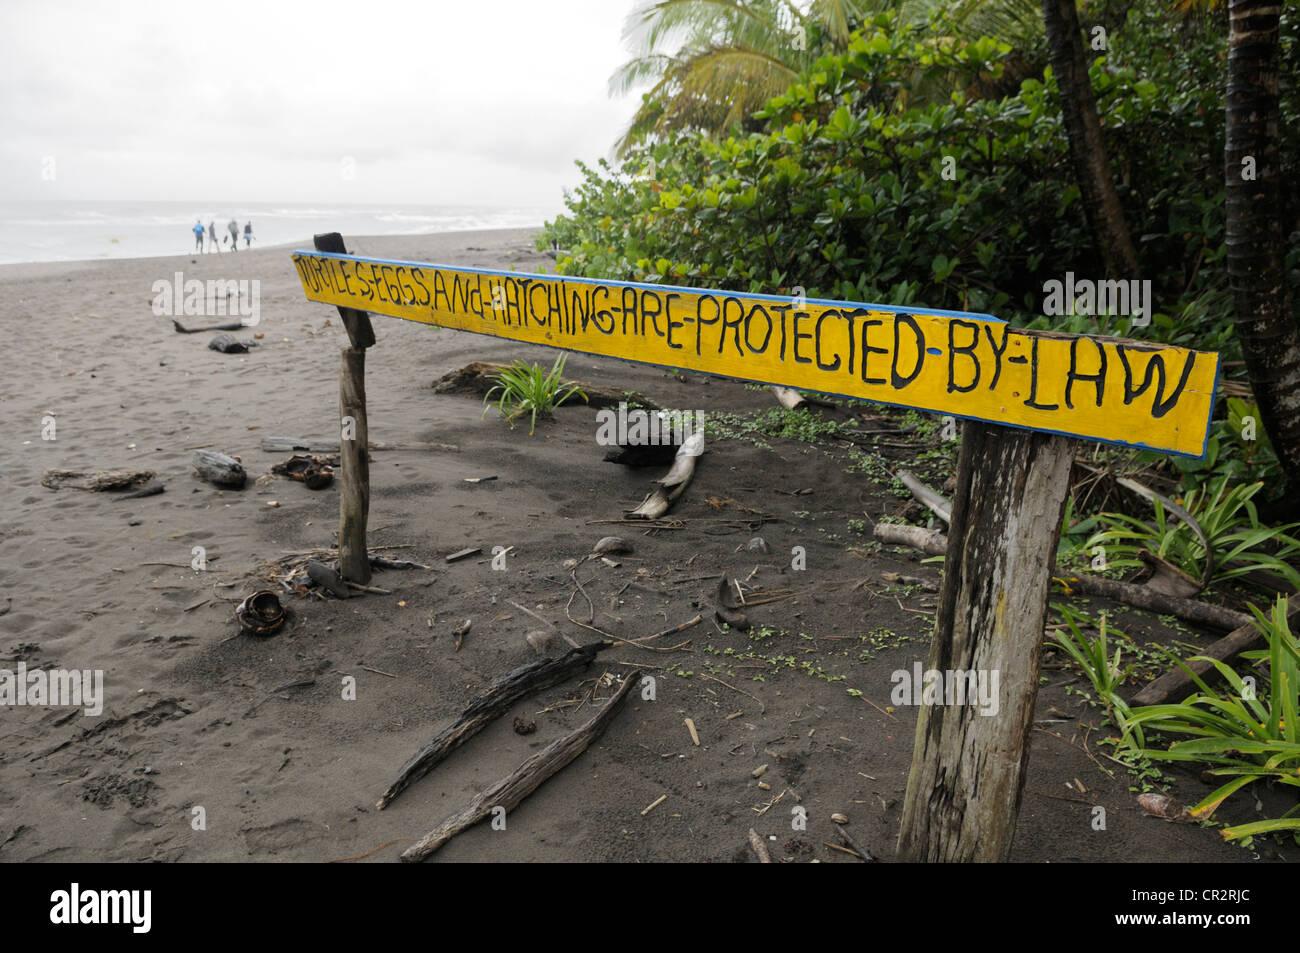 Tortuguero turtle nesting beach preserve - Tortuguero National Park, Costa Rica - Stock Image